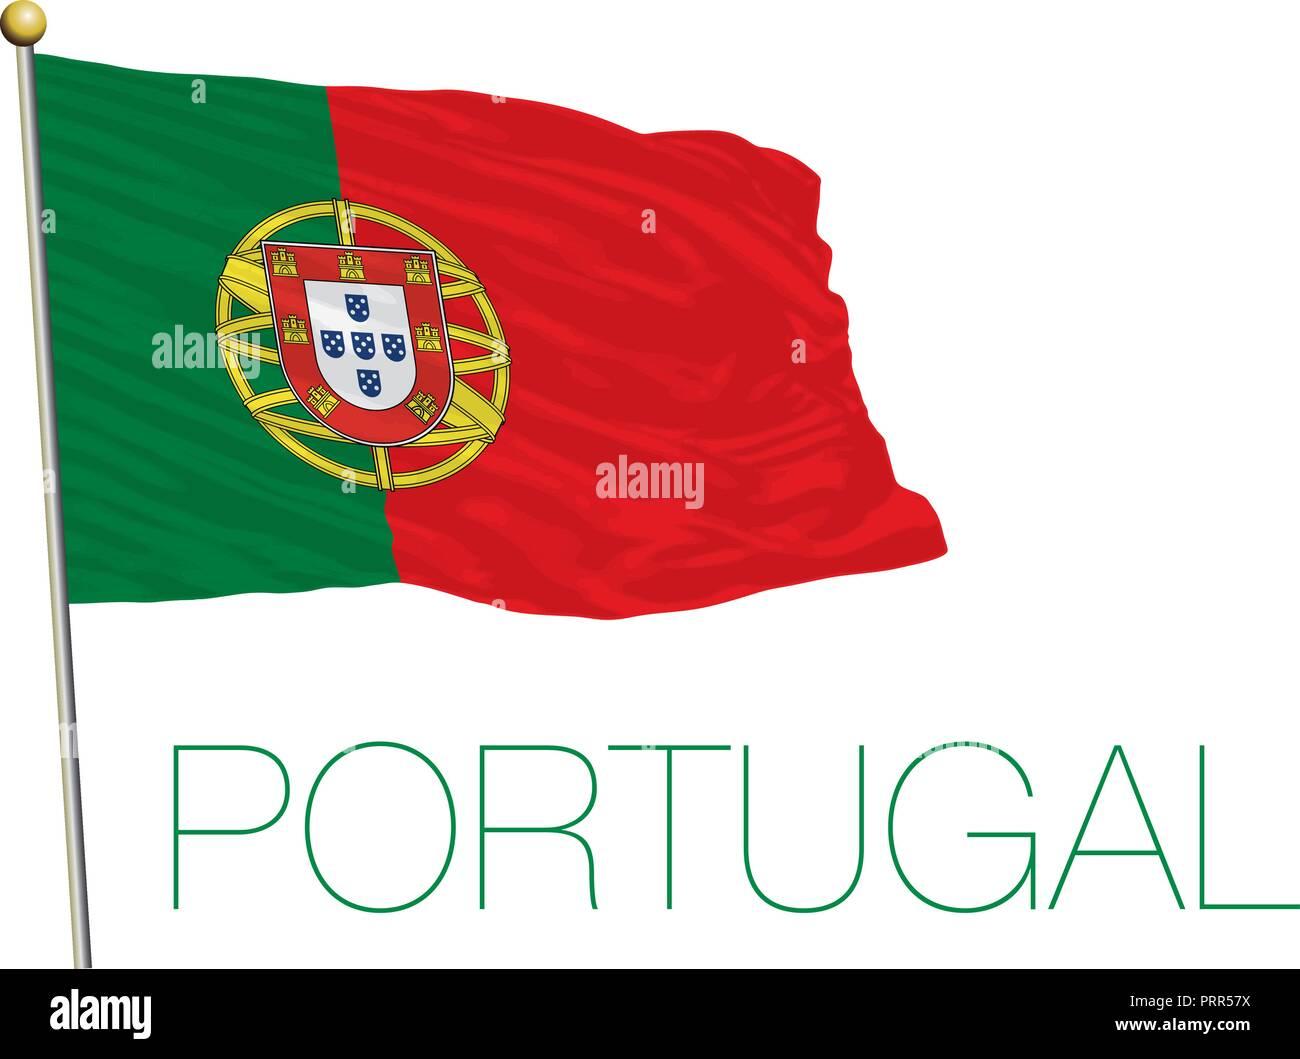 Portugal official flag, vector illustration Stock Vector